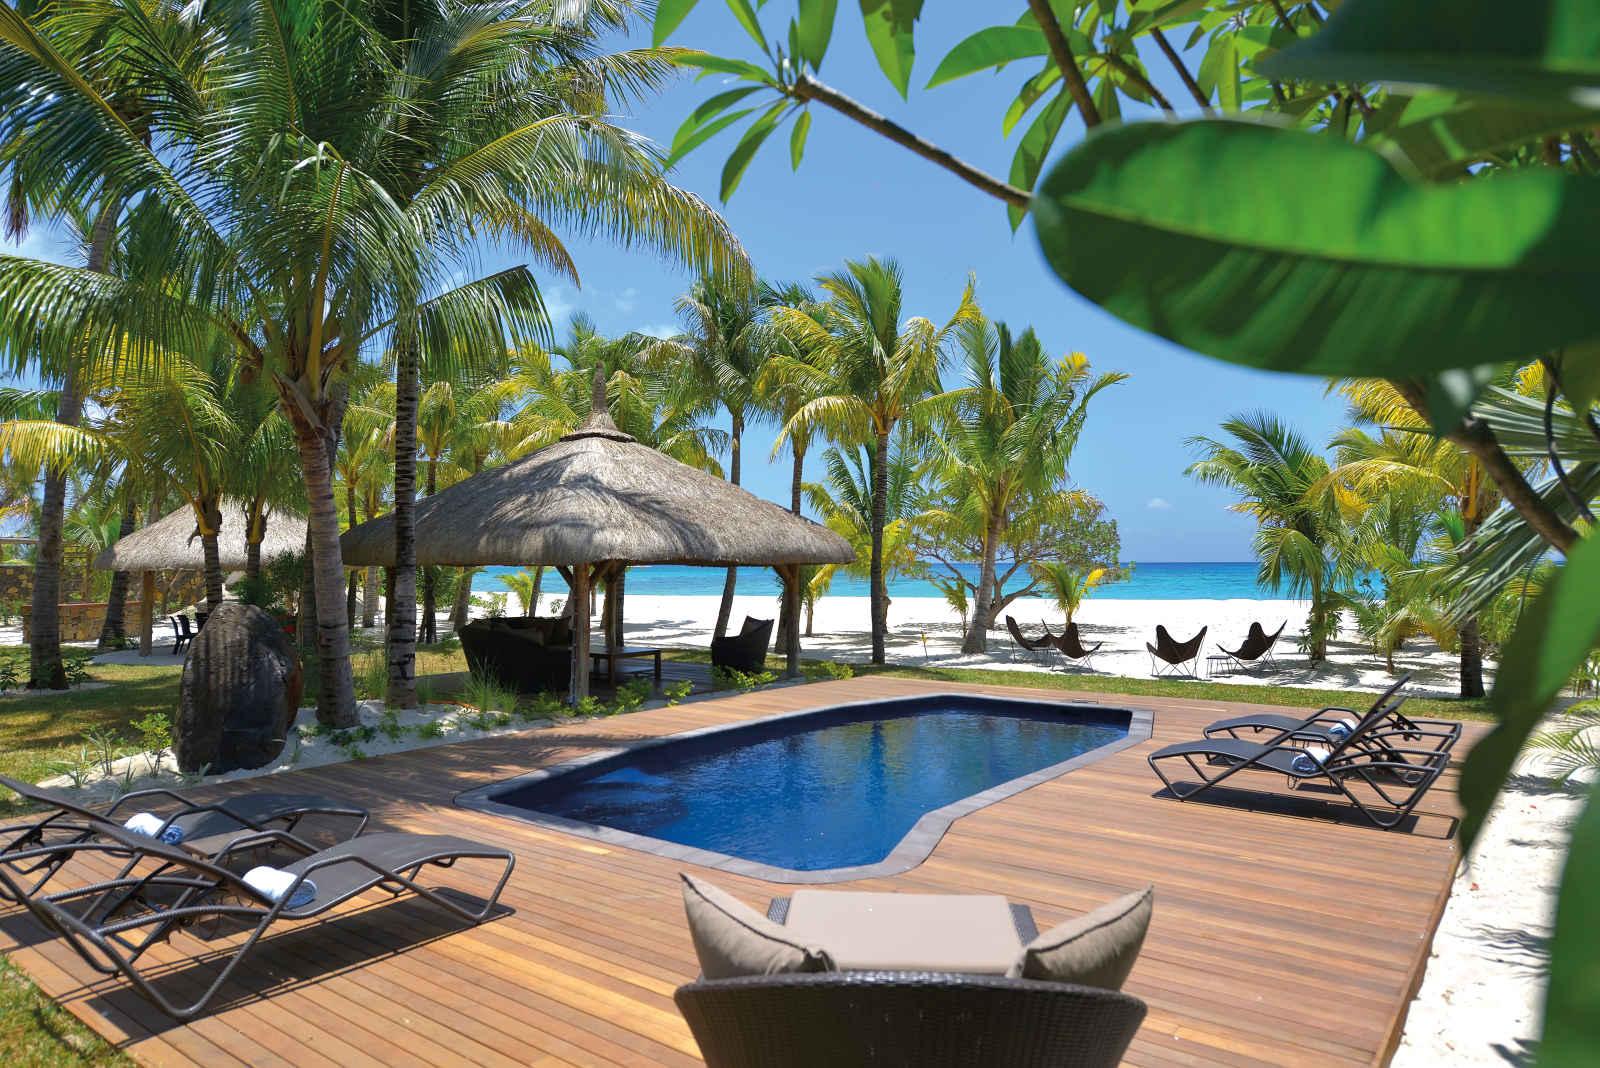 Dinarobin beachcomber Golf Resort & Spa - 5* - voyage  - sejour